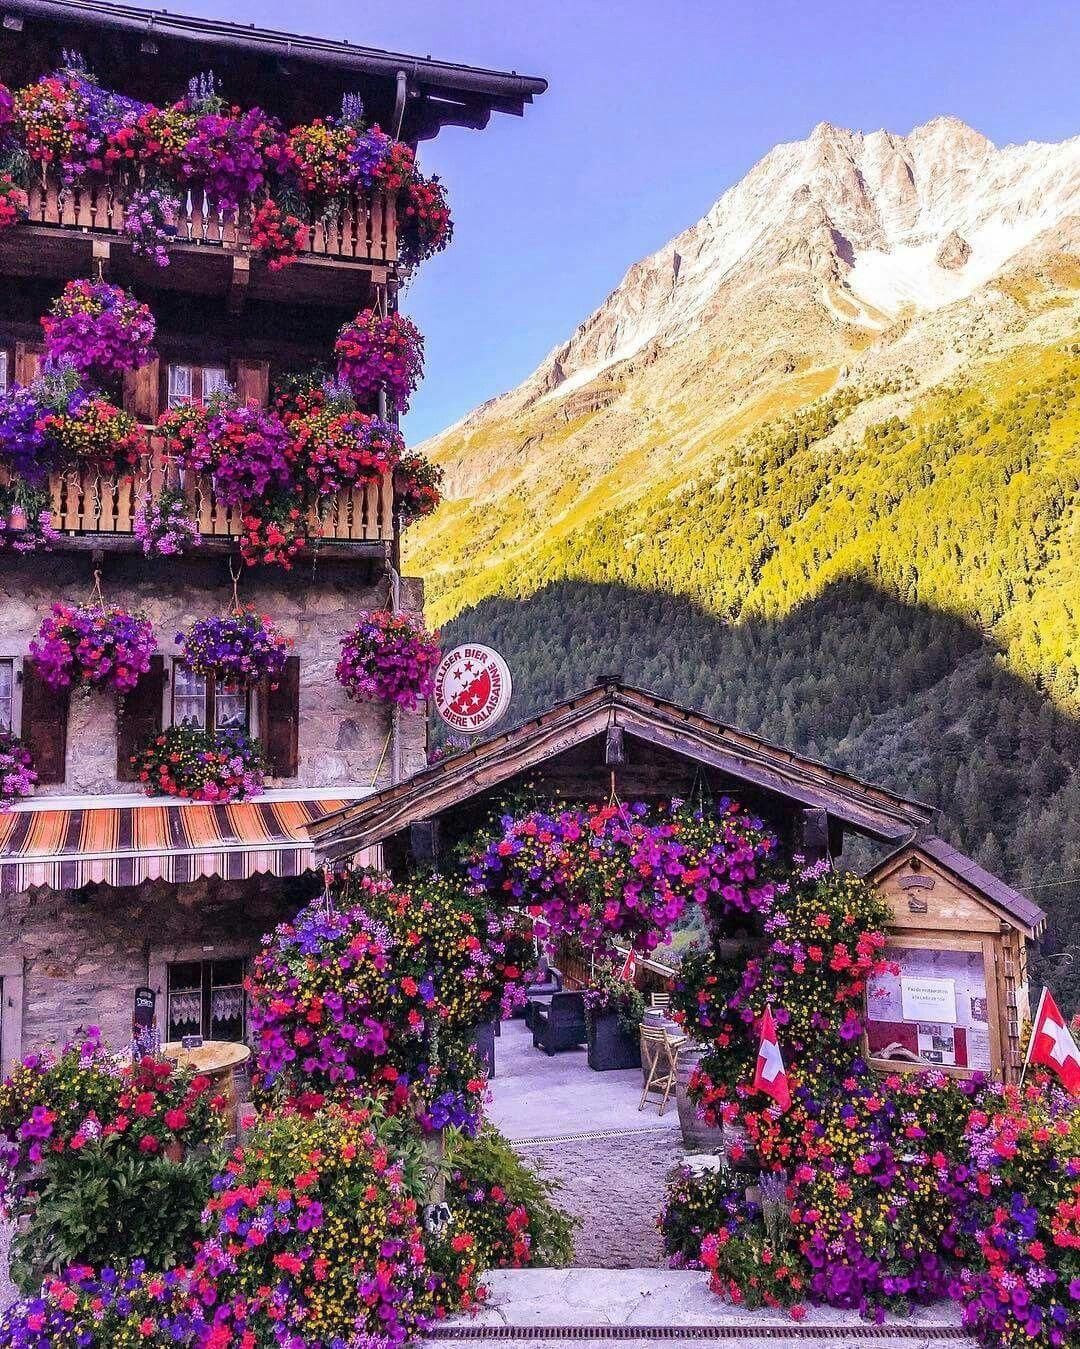 Hotel du Glacier in Arolla, Valais Photo by: @sennarelax